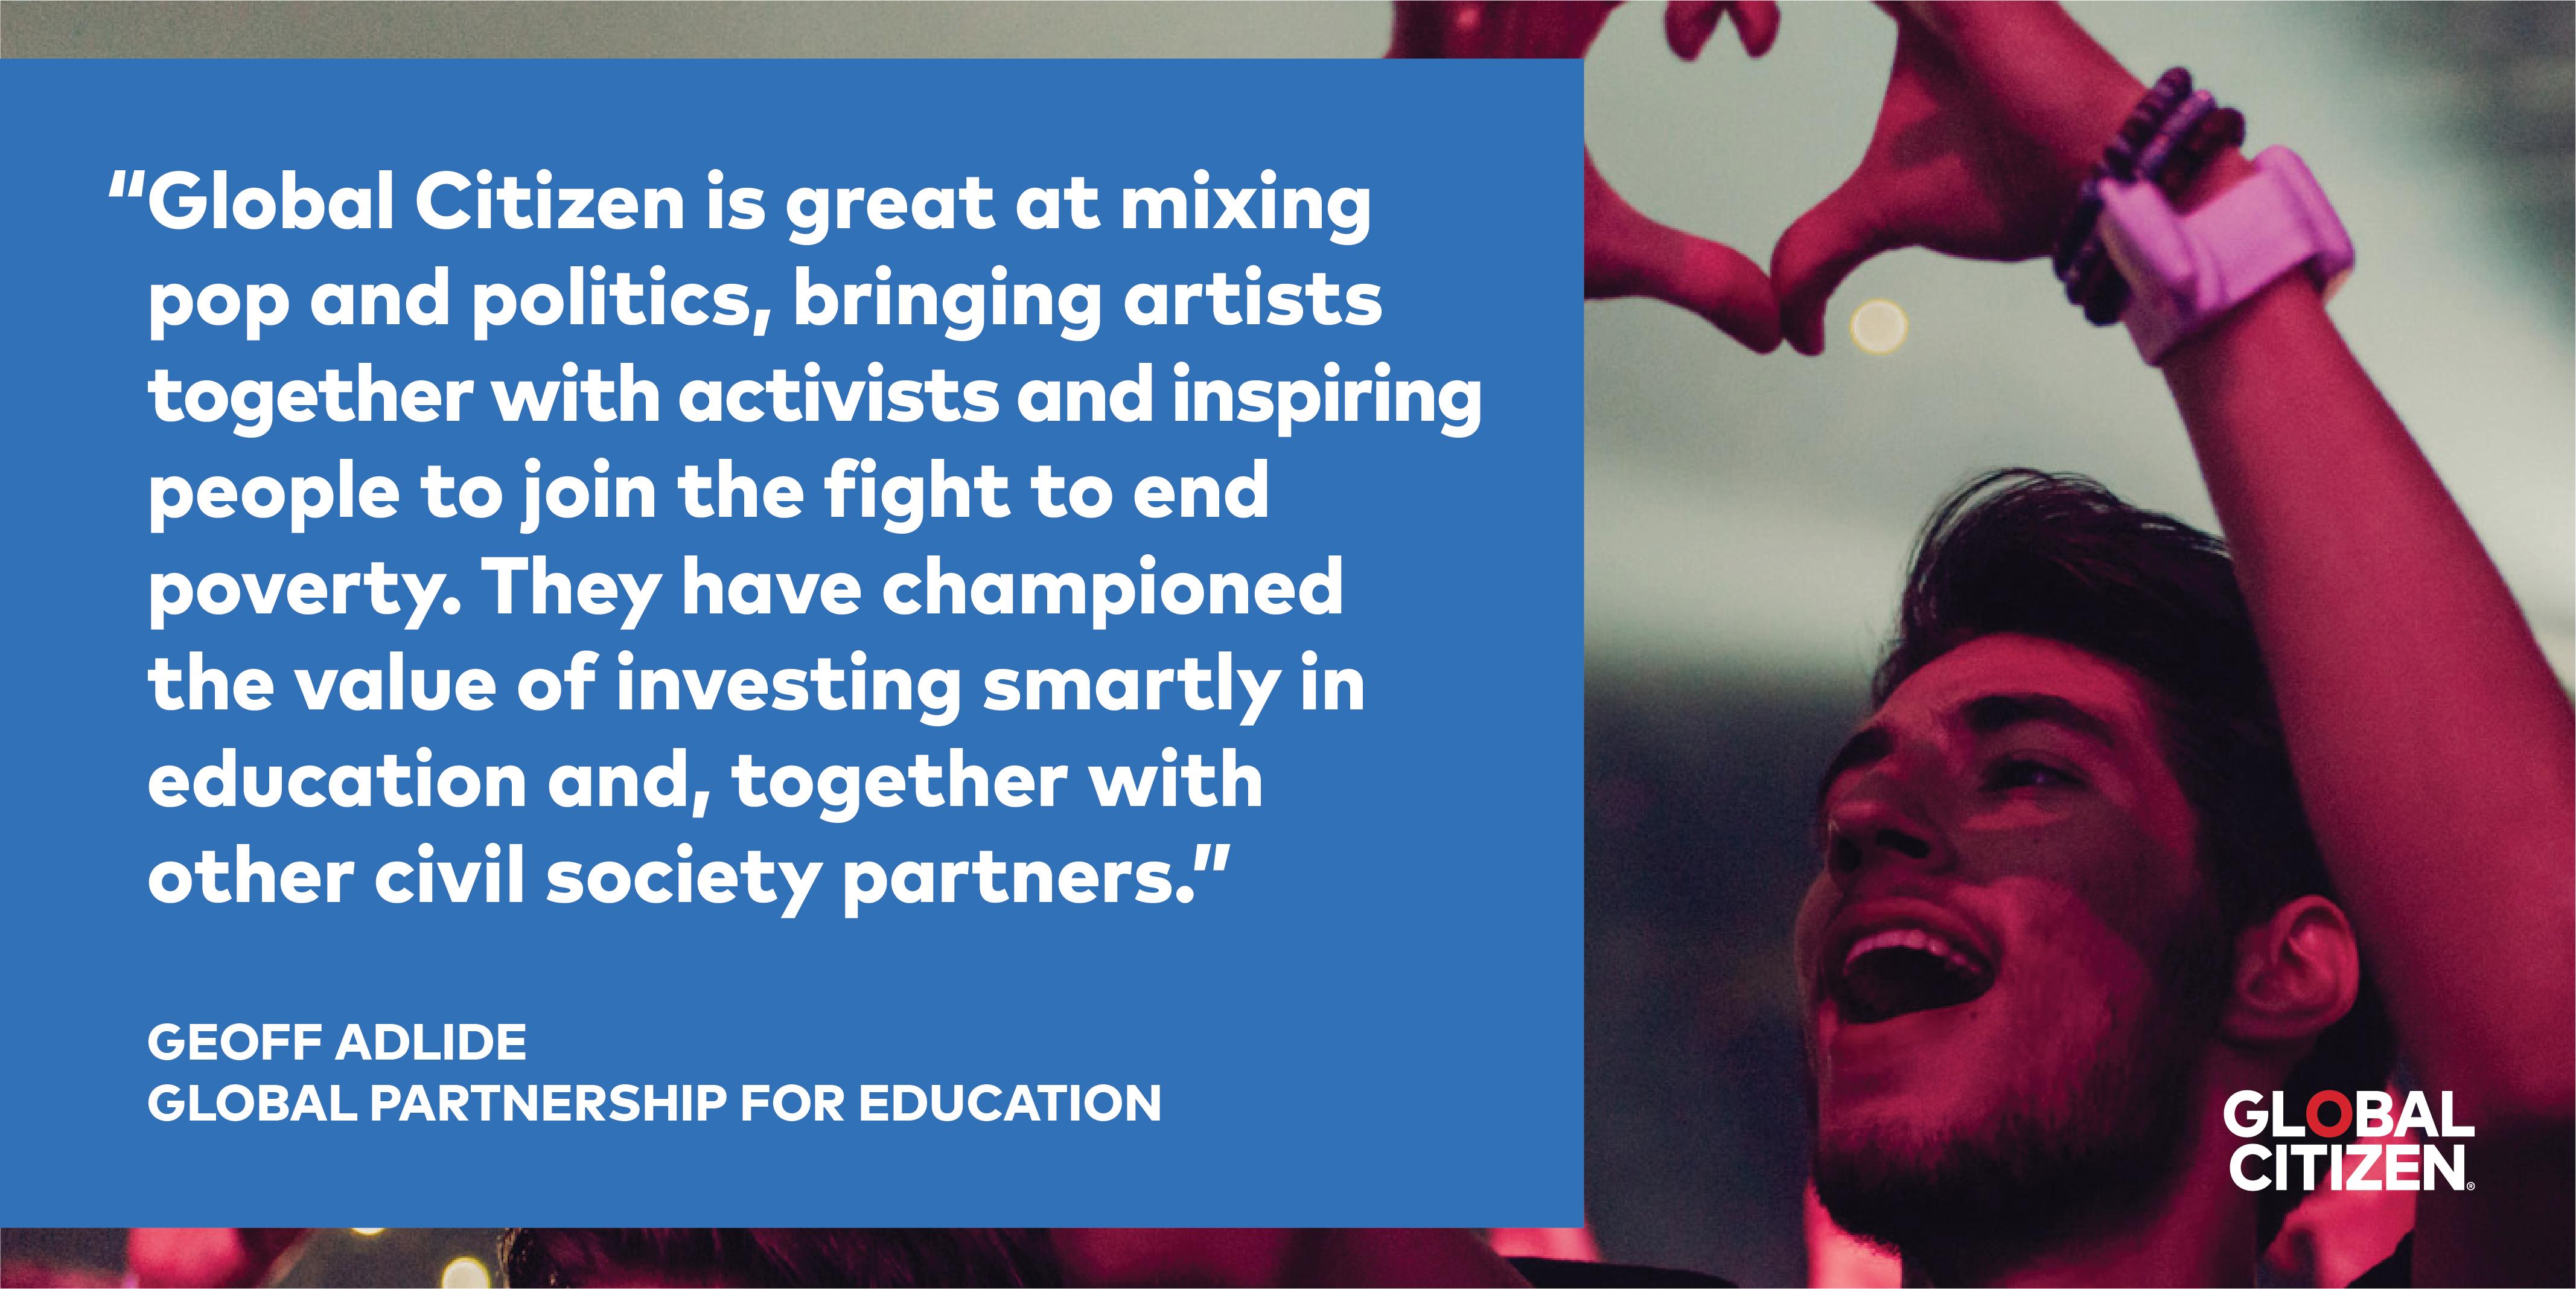 Global Partnerhsip for Education's, Geoff Adlide speaks in praise of Global Citizen's campaign efforts